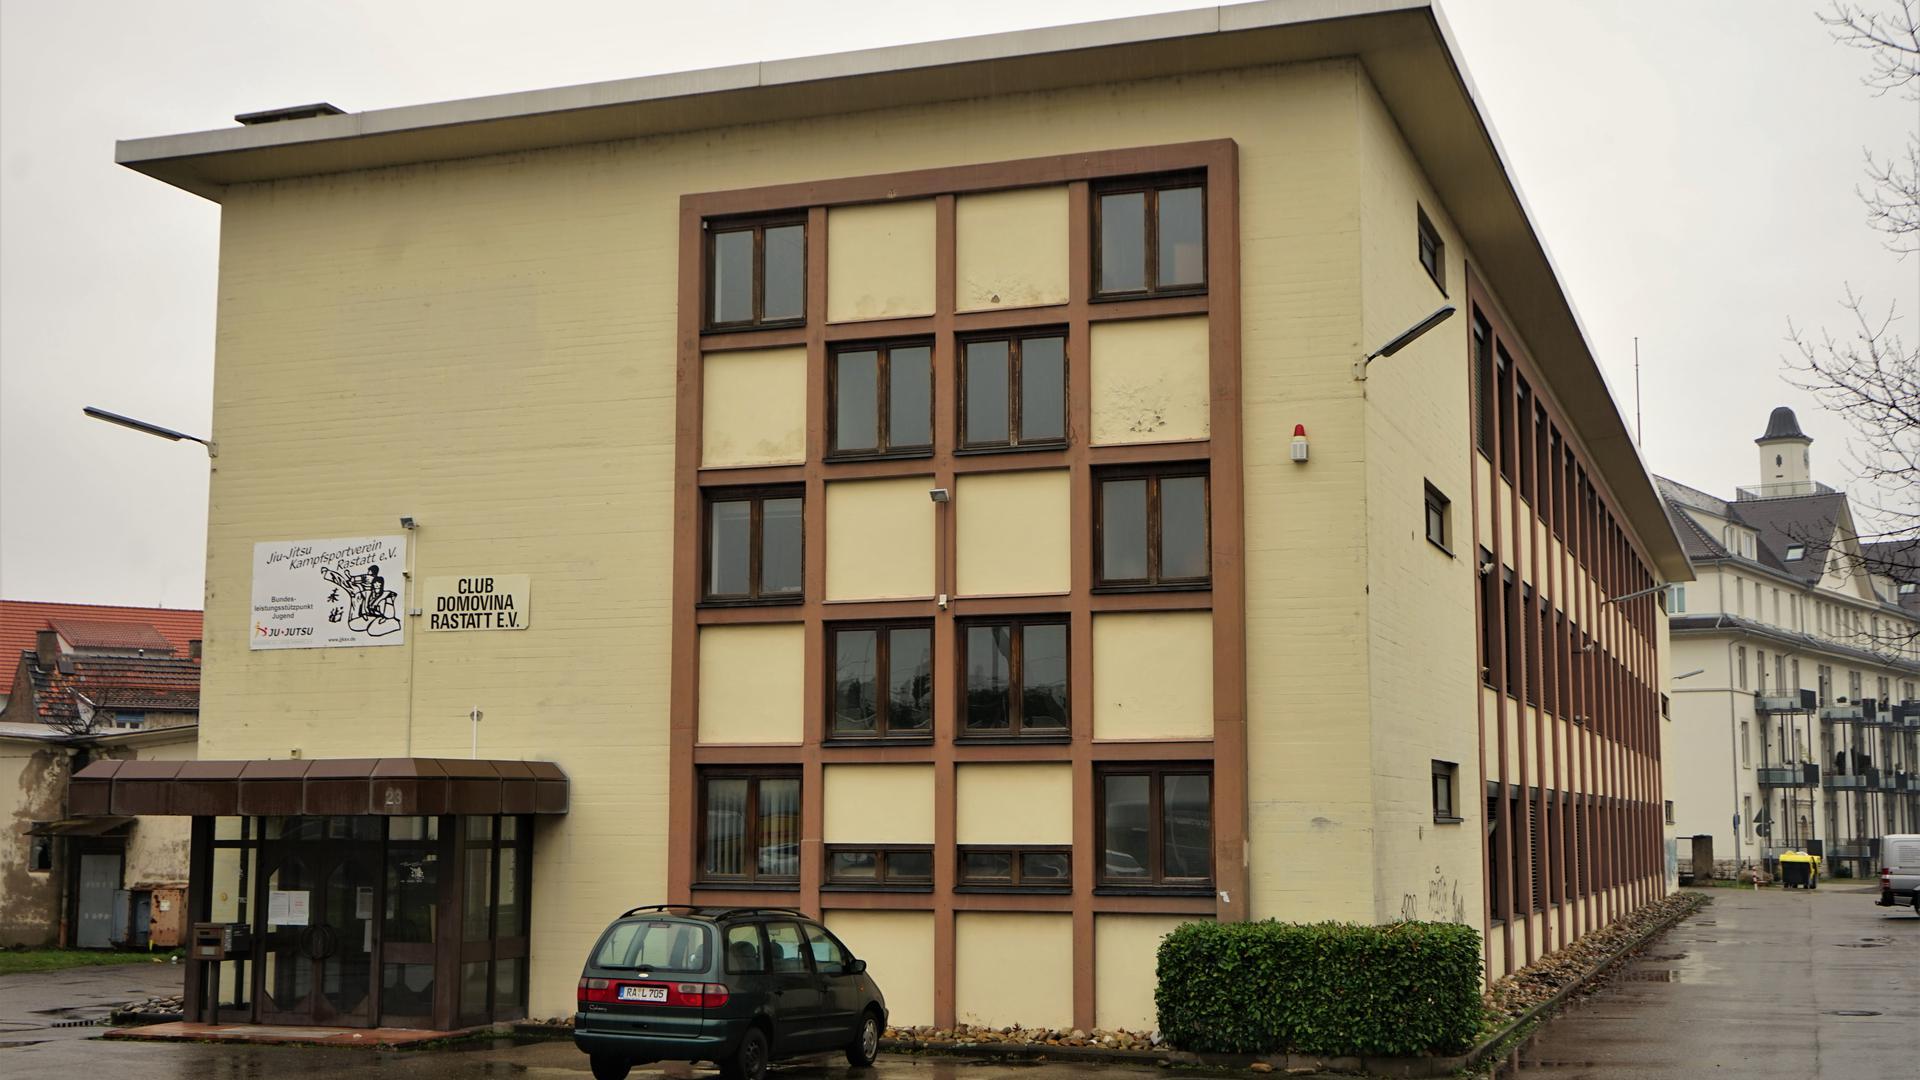 Ehemaliges SWI-Gebäude in Rastatt